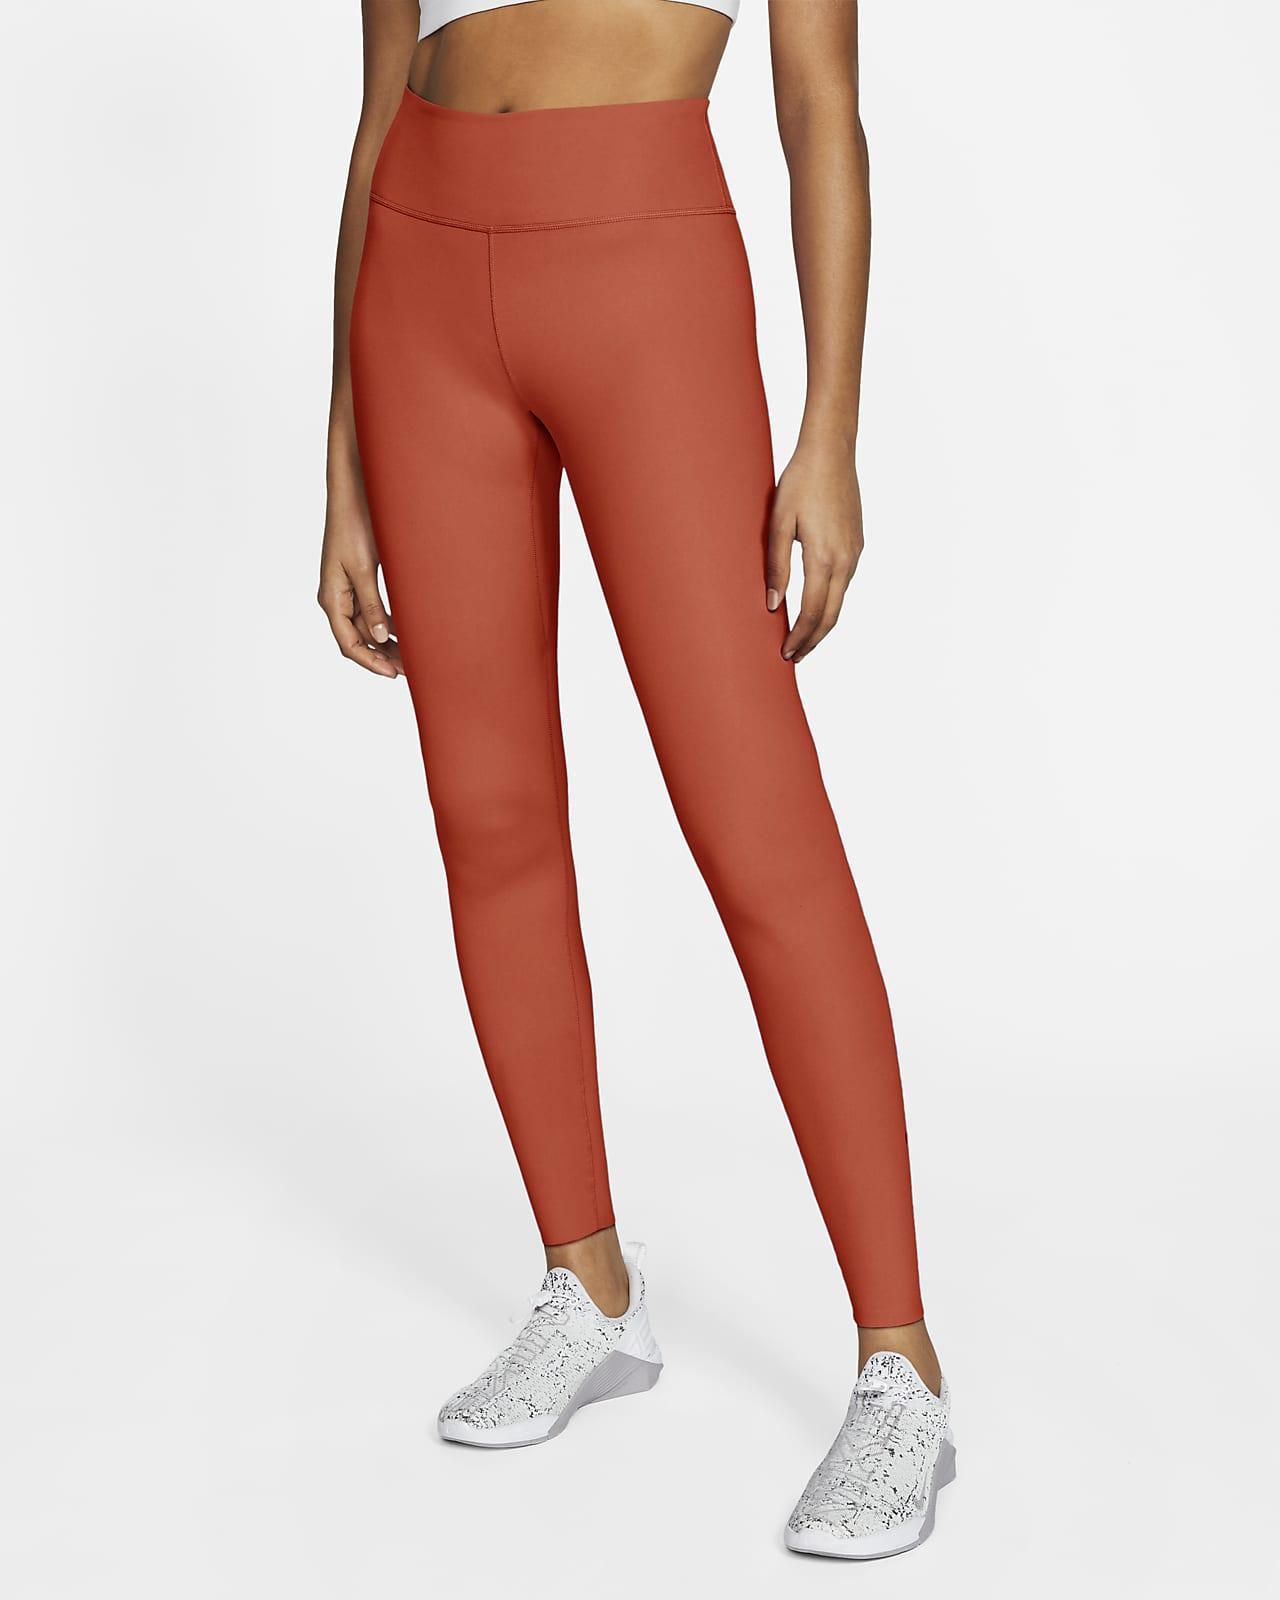 Tights de cintura normal Nike One Luxe para mulher